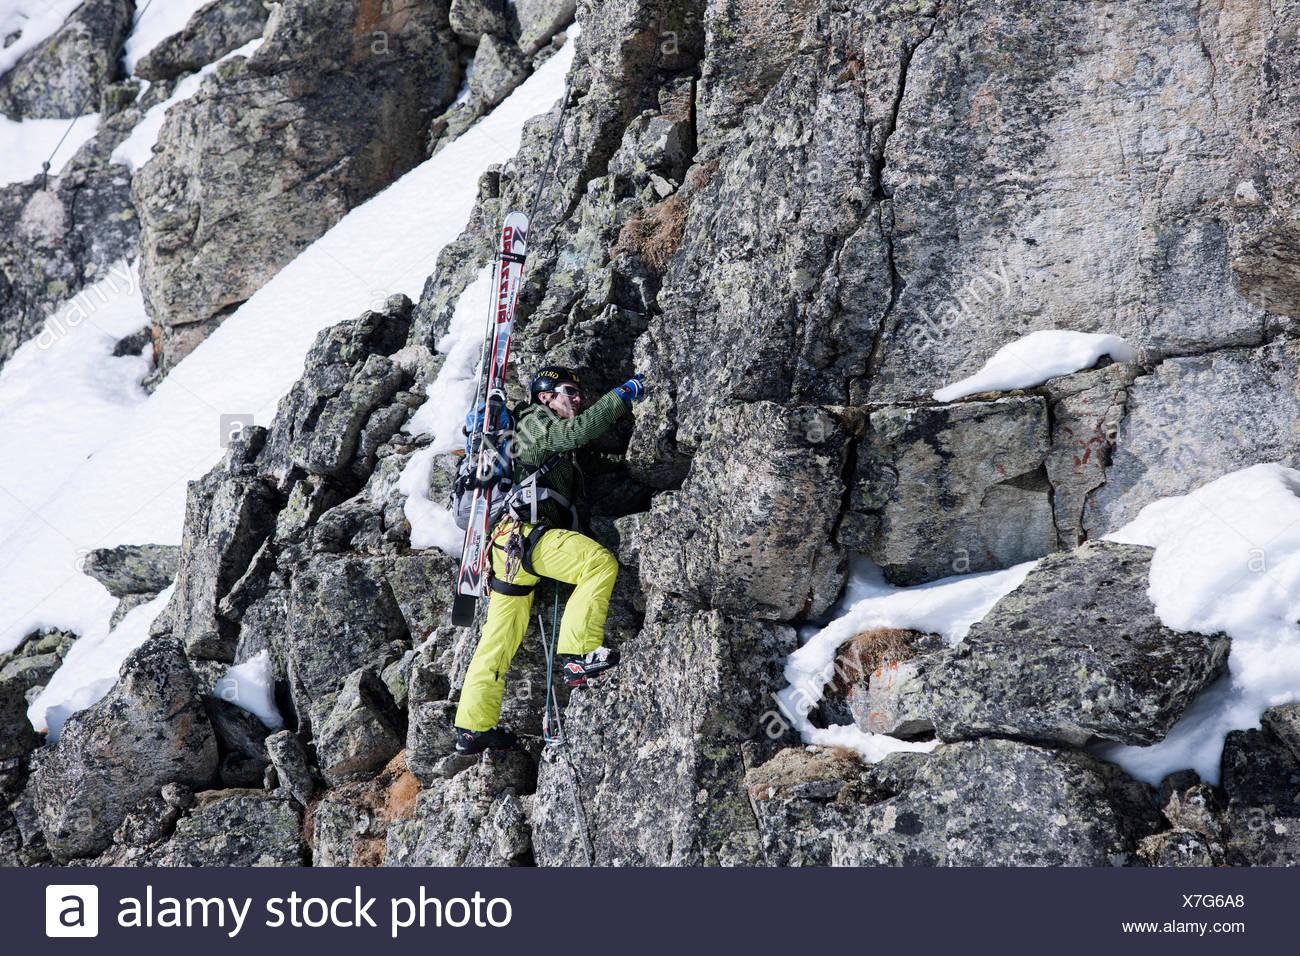 Freeride skier ascending the Winterklettersteig climbing route, Arlberg, Verwall Group, North Tyrol, Austria - Stock Image